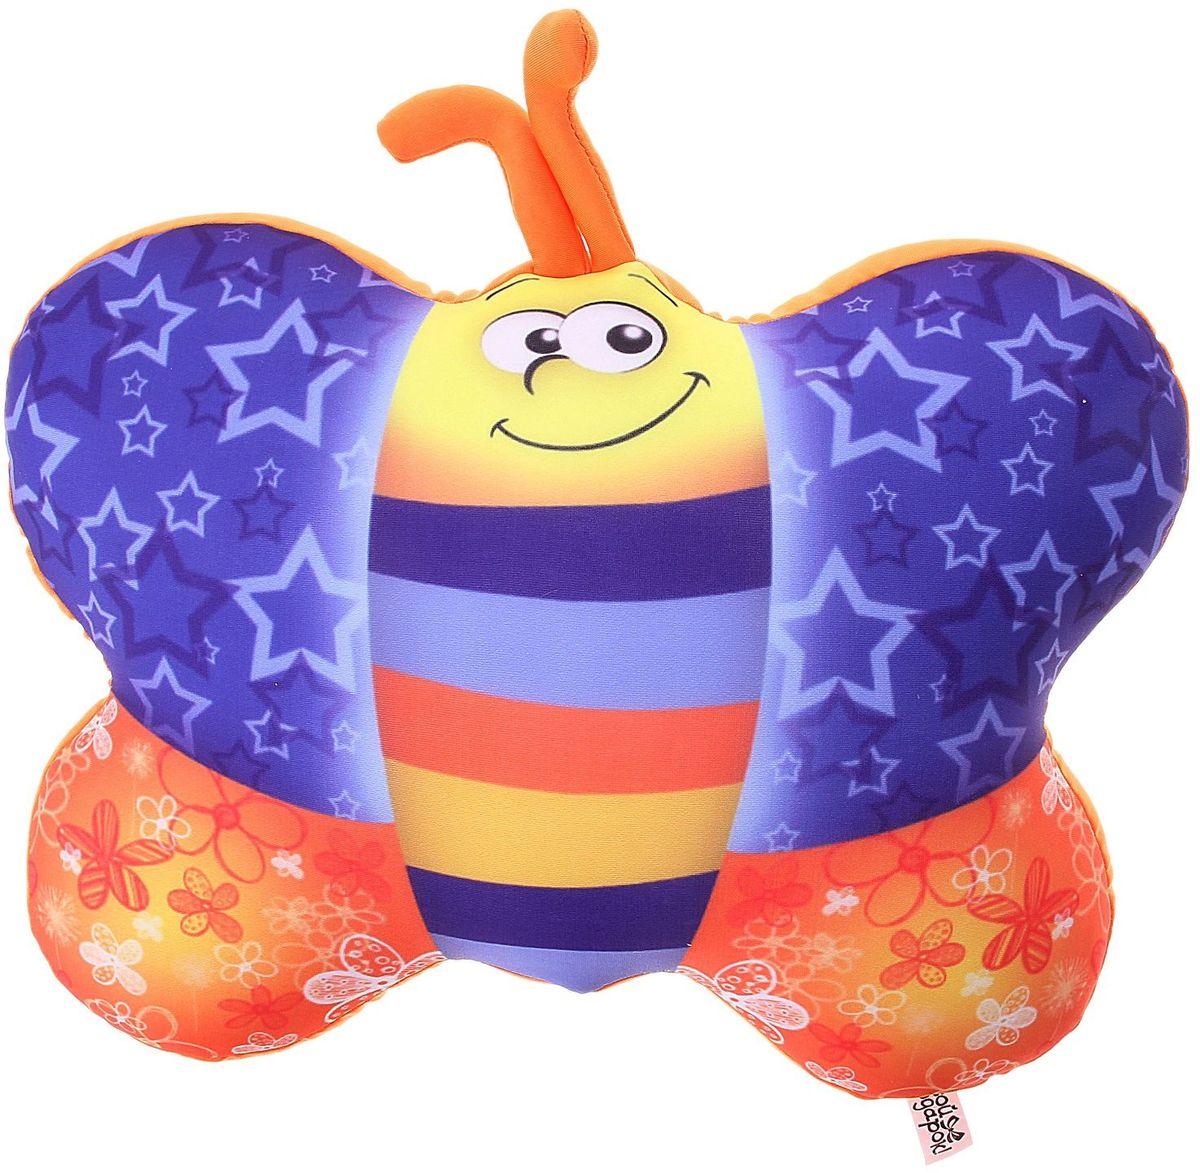 Sima-land Мягкая игрушка-антистресс Бабочка 330463 sima land мягкая игрушка антистресс